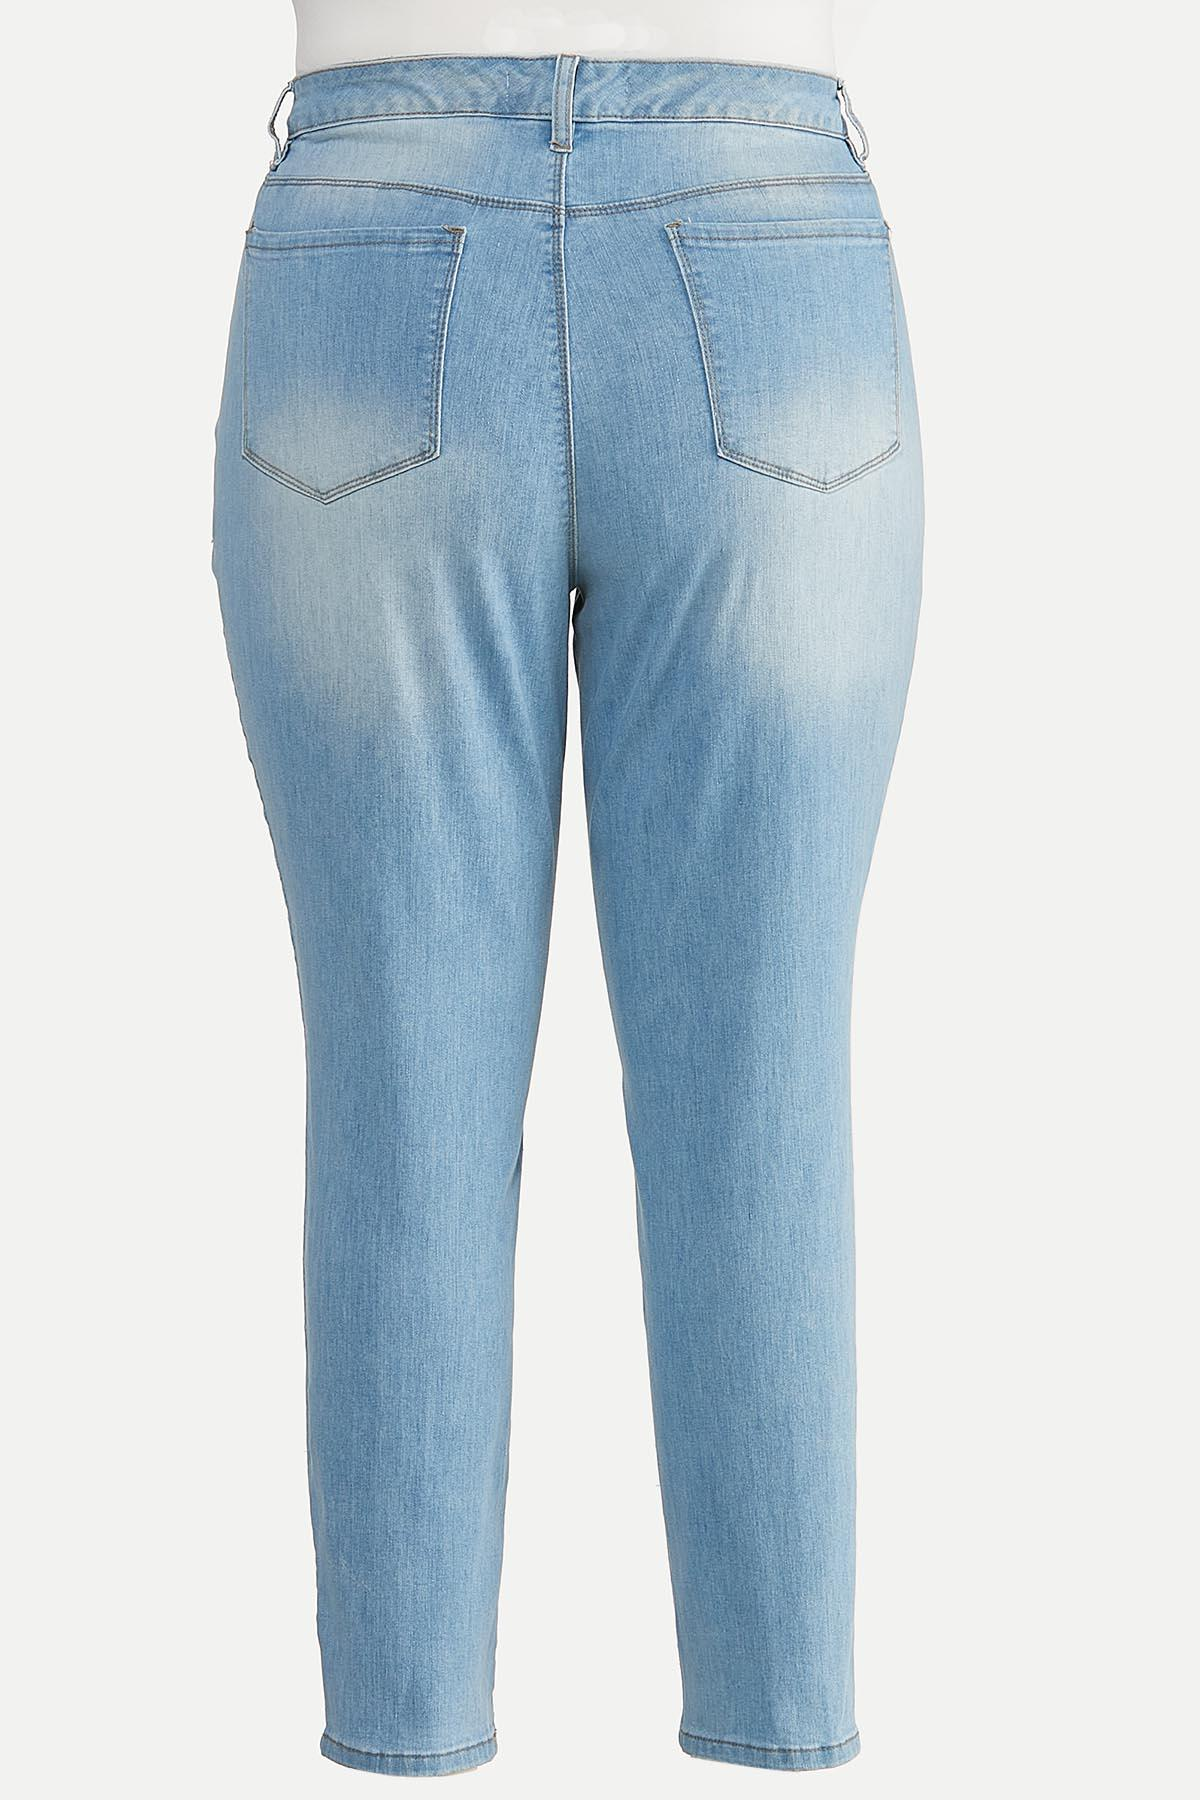 Plus Size Light Wash Skinny Jeans (Item #44606680)